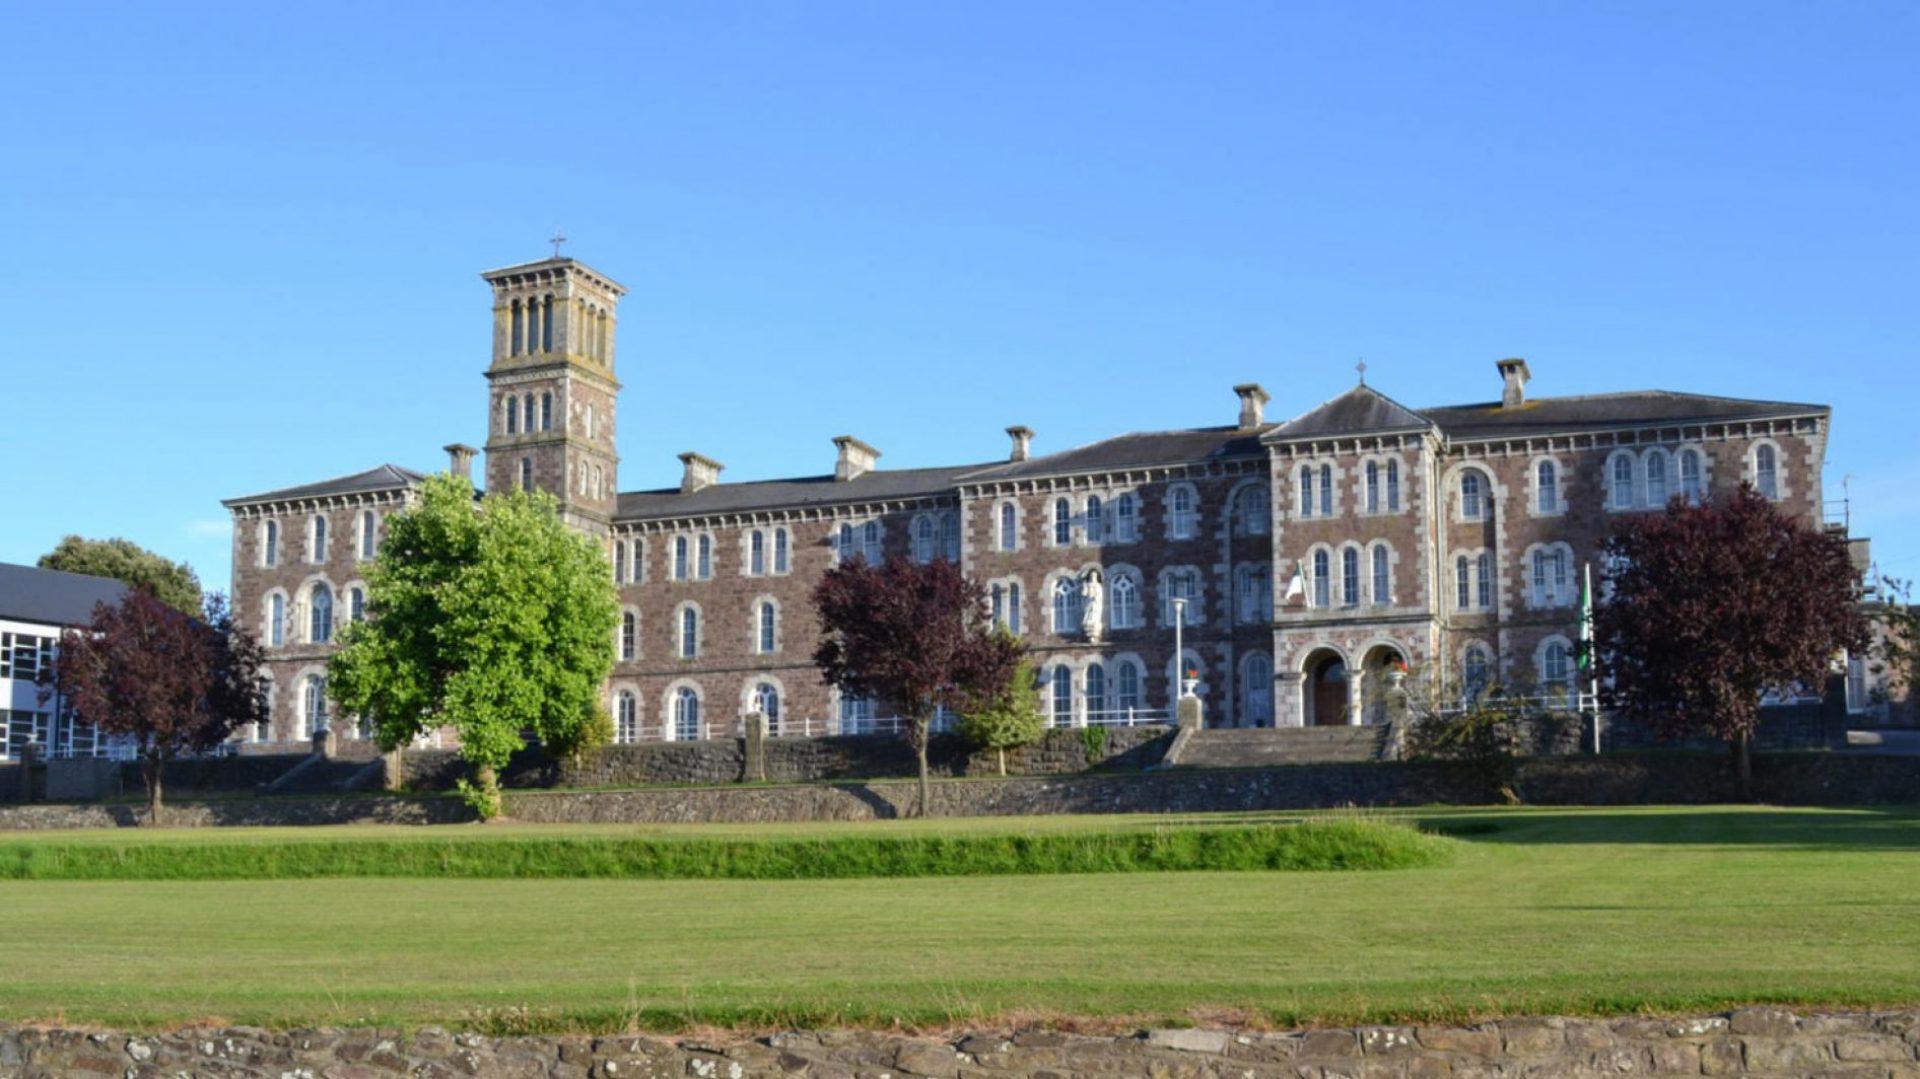 St. Colman's College Fermoy